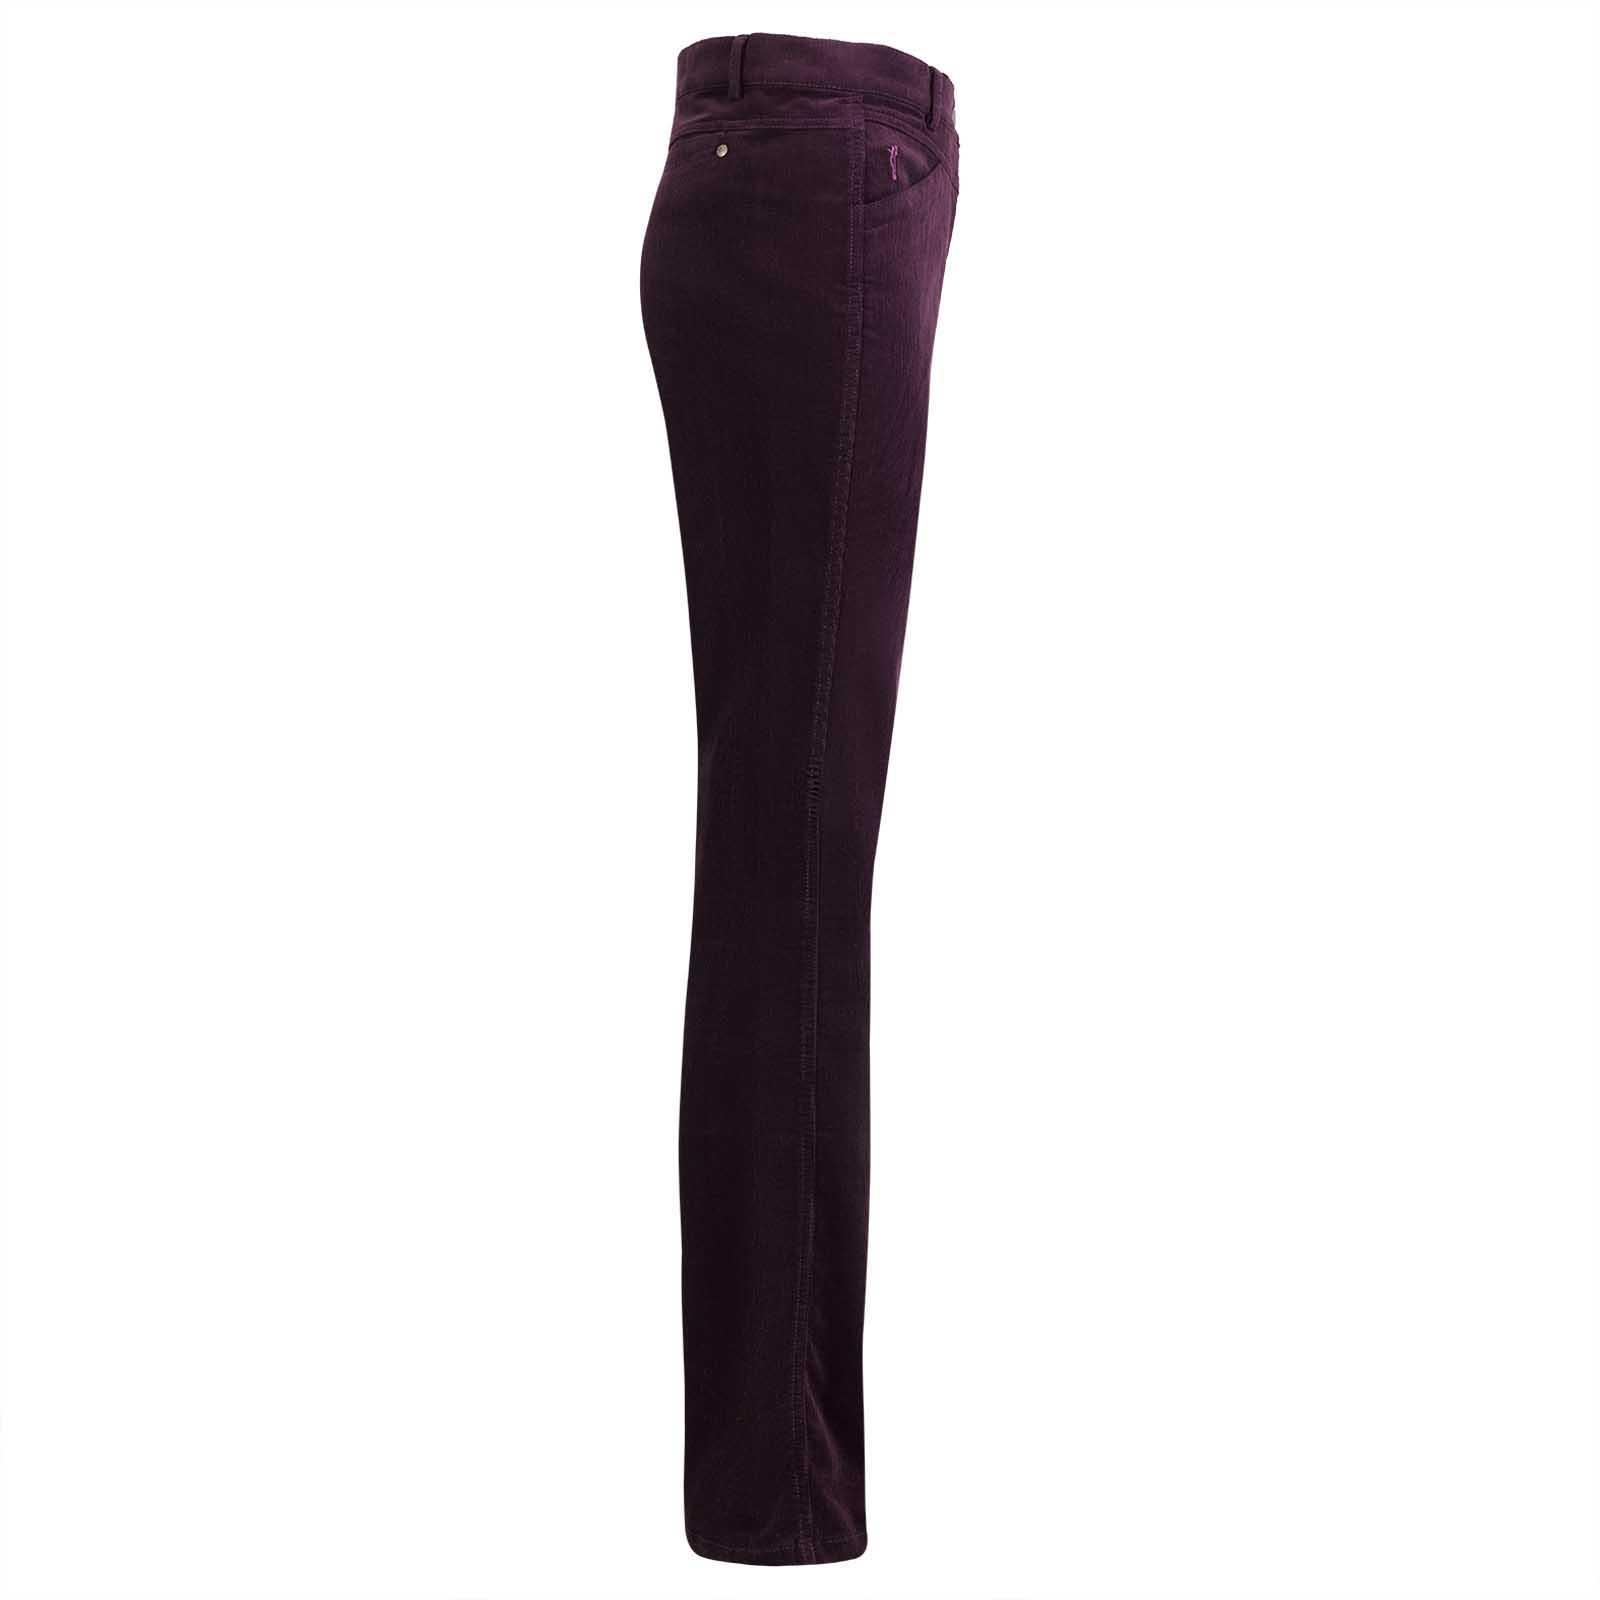 Gerade geschnittene Damenhose aus hochwertigem Stretch-Cord